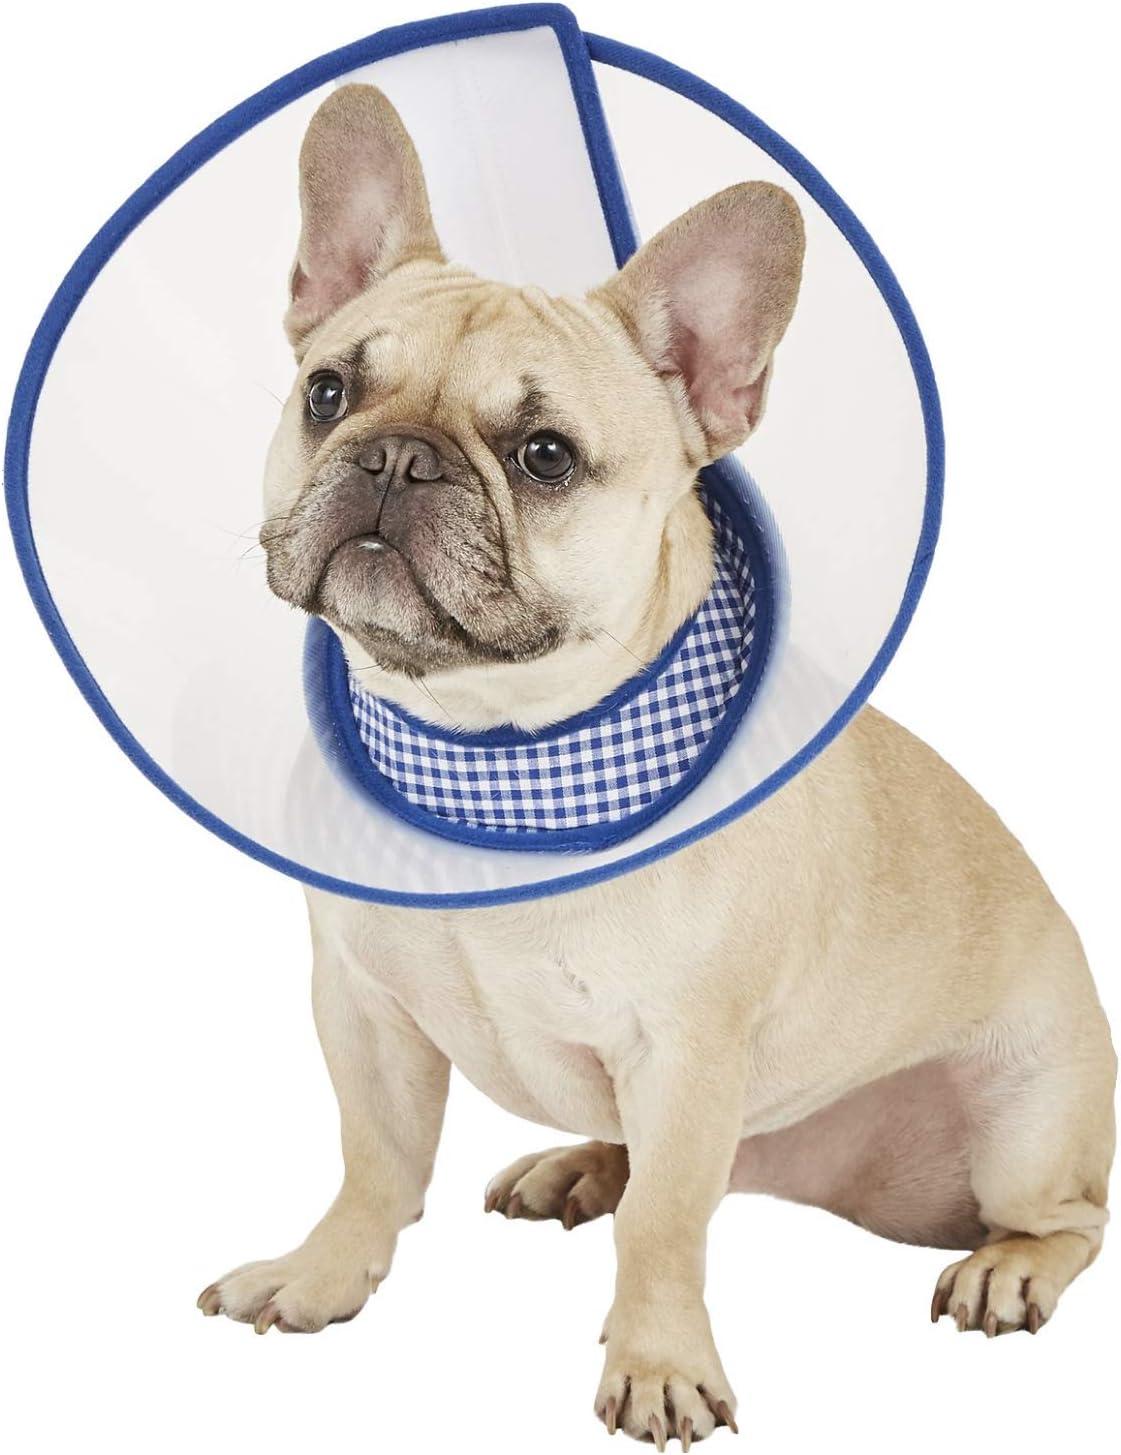 American Staffordshire Bull Terrier Dog Soft Velvet Feel Cushion Co AD-SBT5-CPW